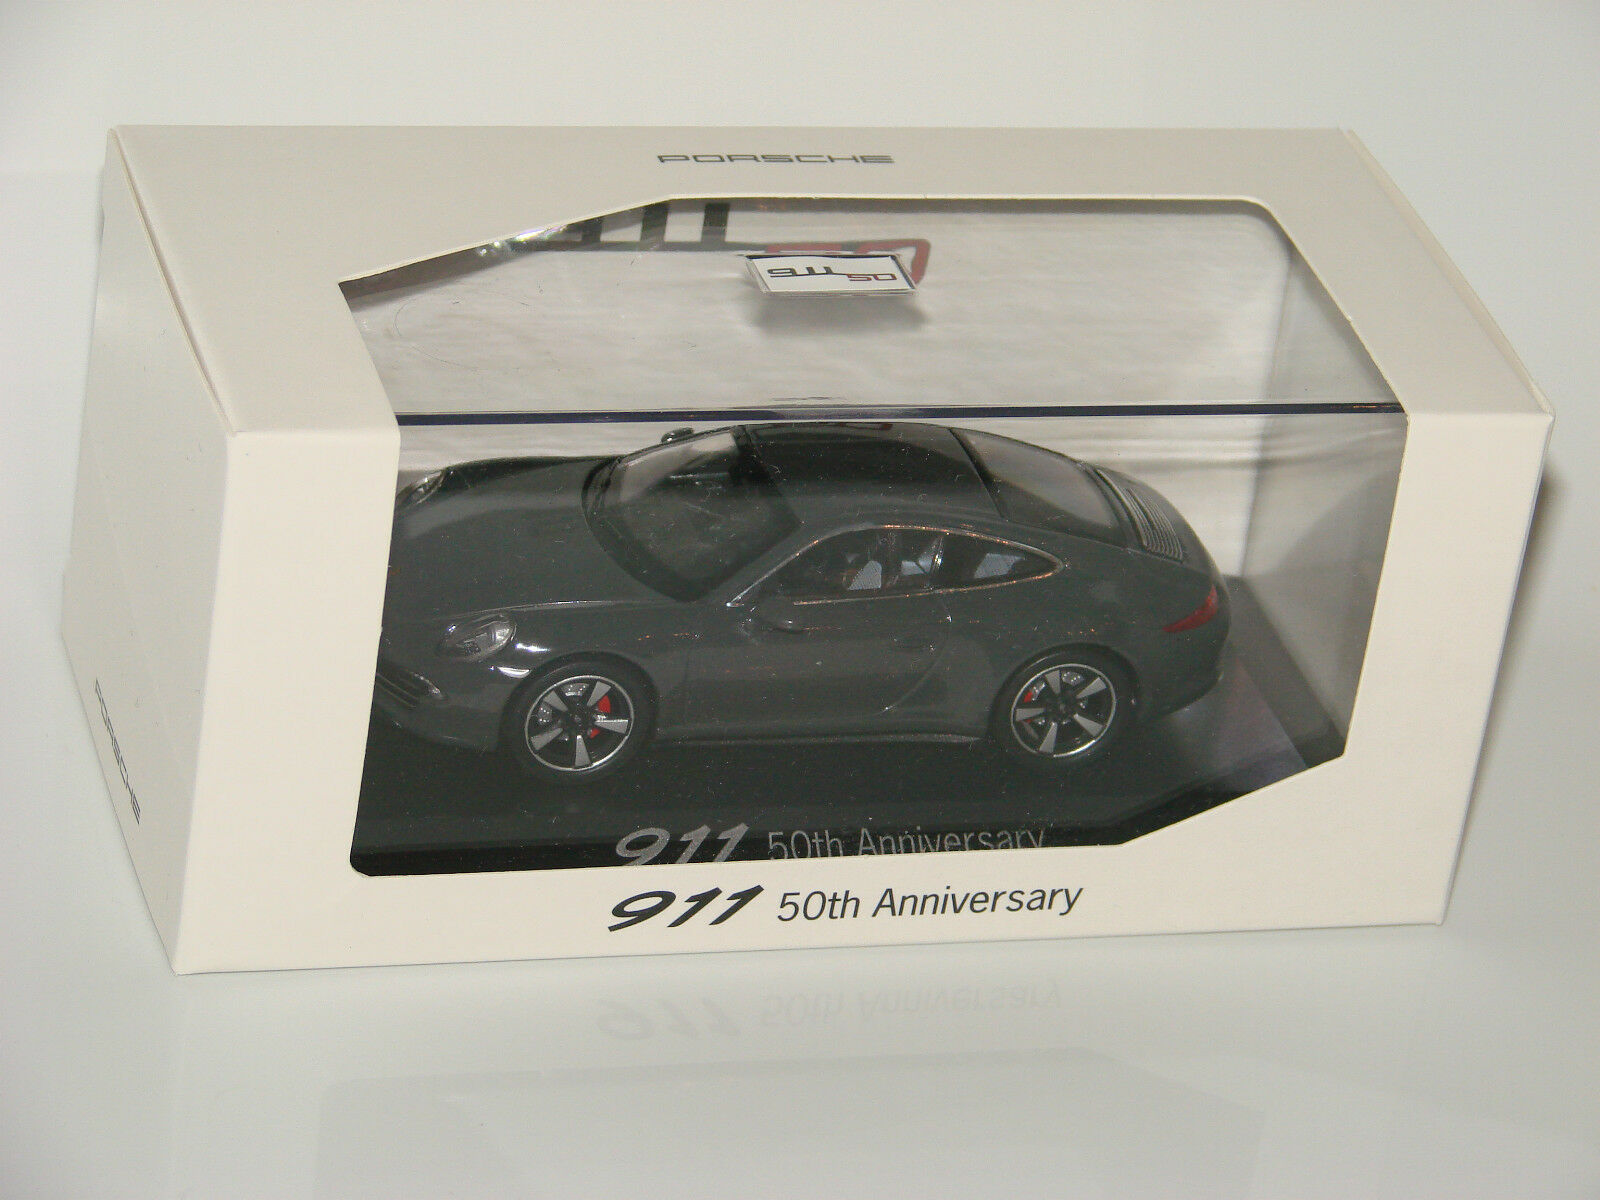 Porsche 911 coupé Graphite gris - 50th Anniversary-special edition 1 43 New